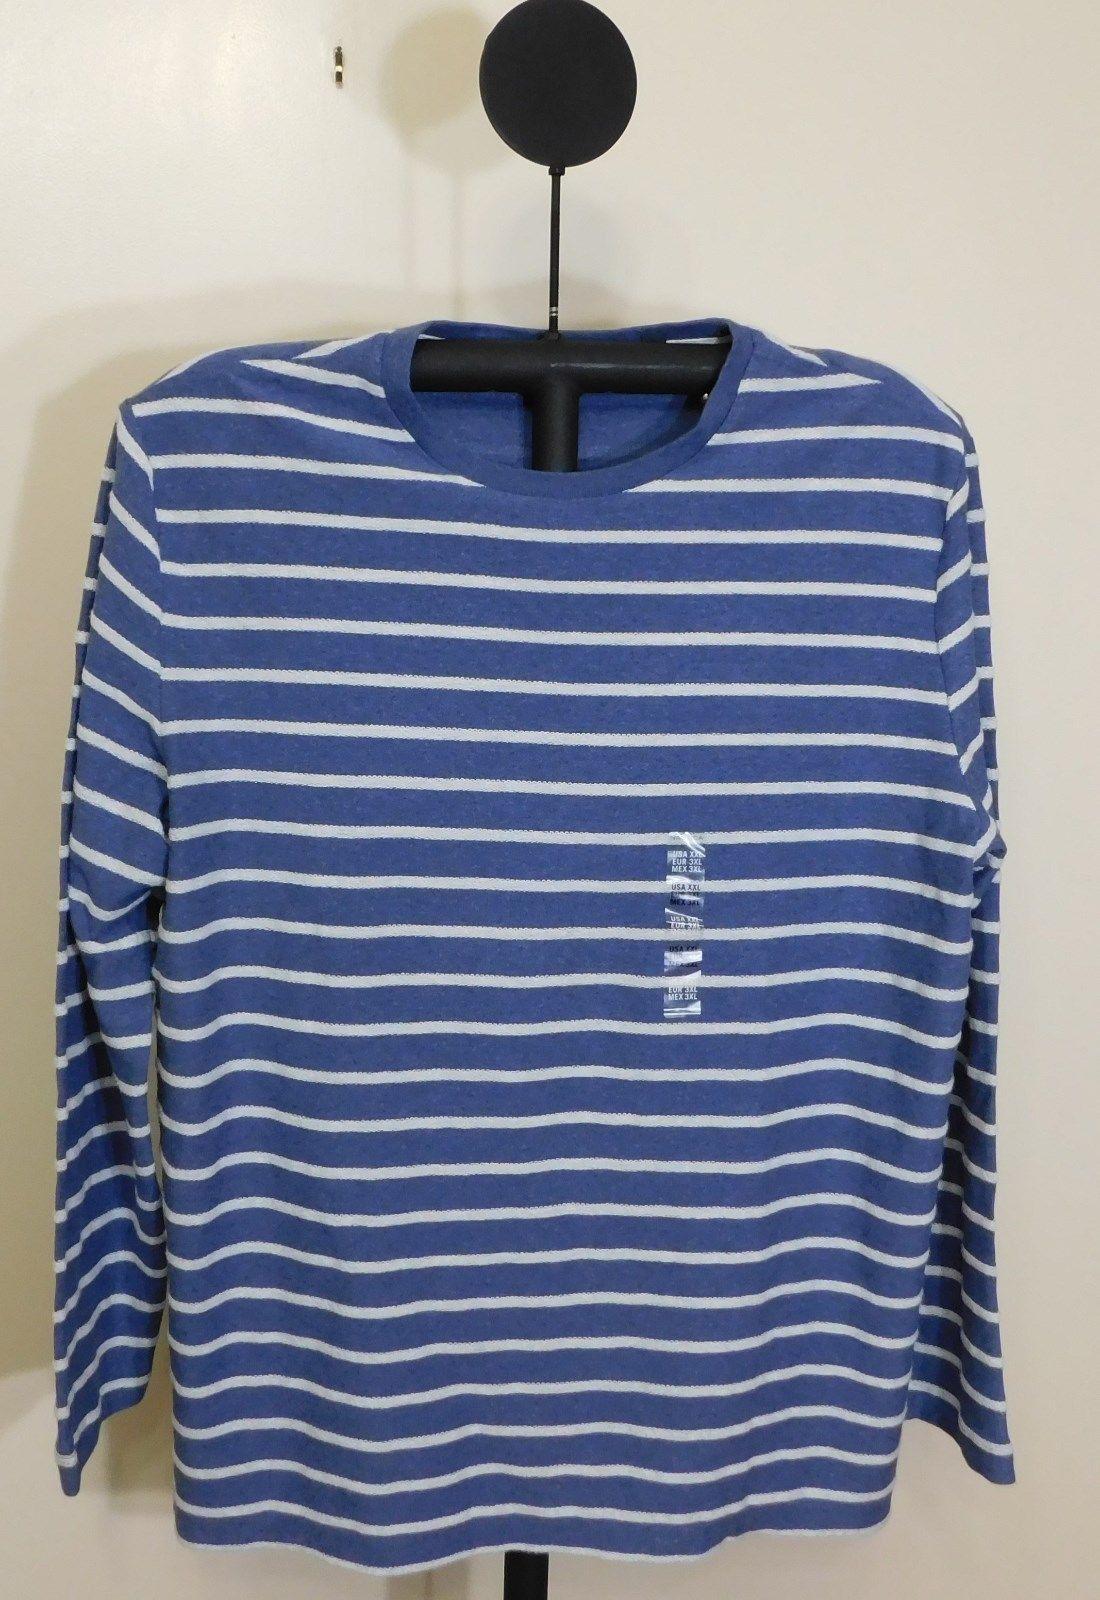 Nautica Blue Indigo Men's Slim-Fit Striped  Crew Neck Long Sleeve Shirt - XXL